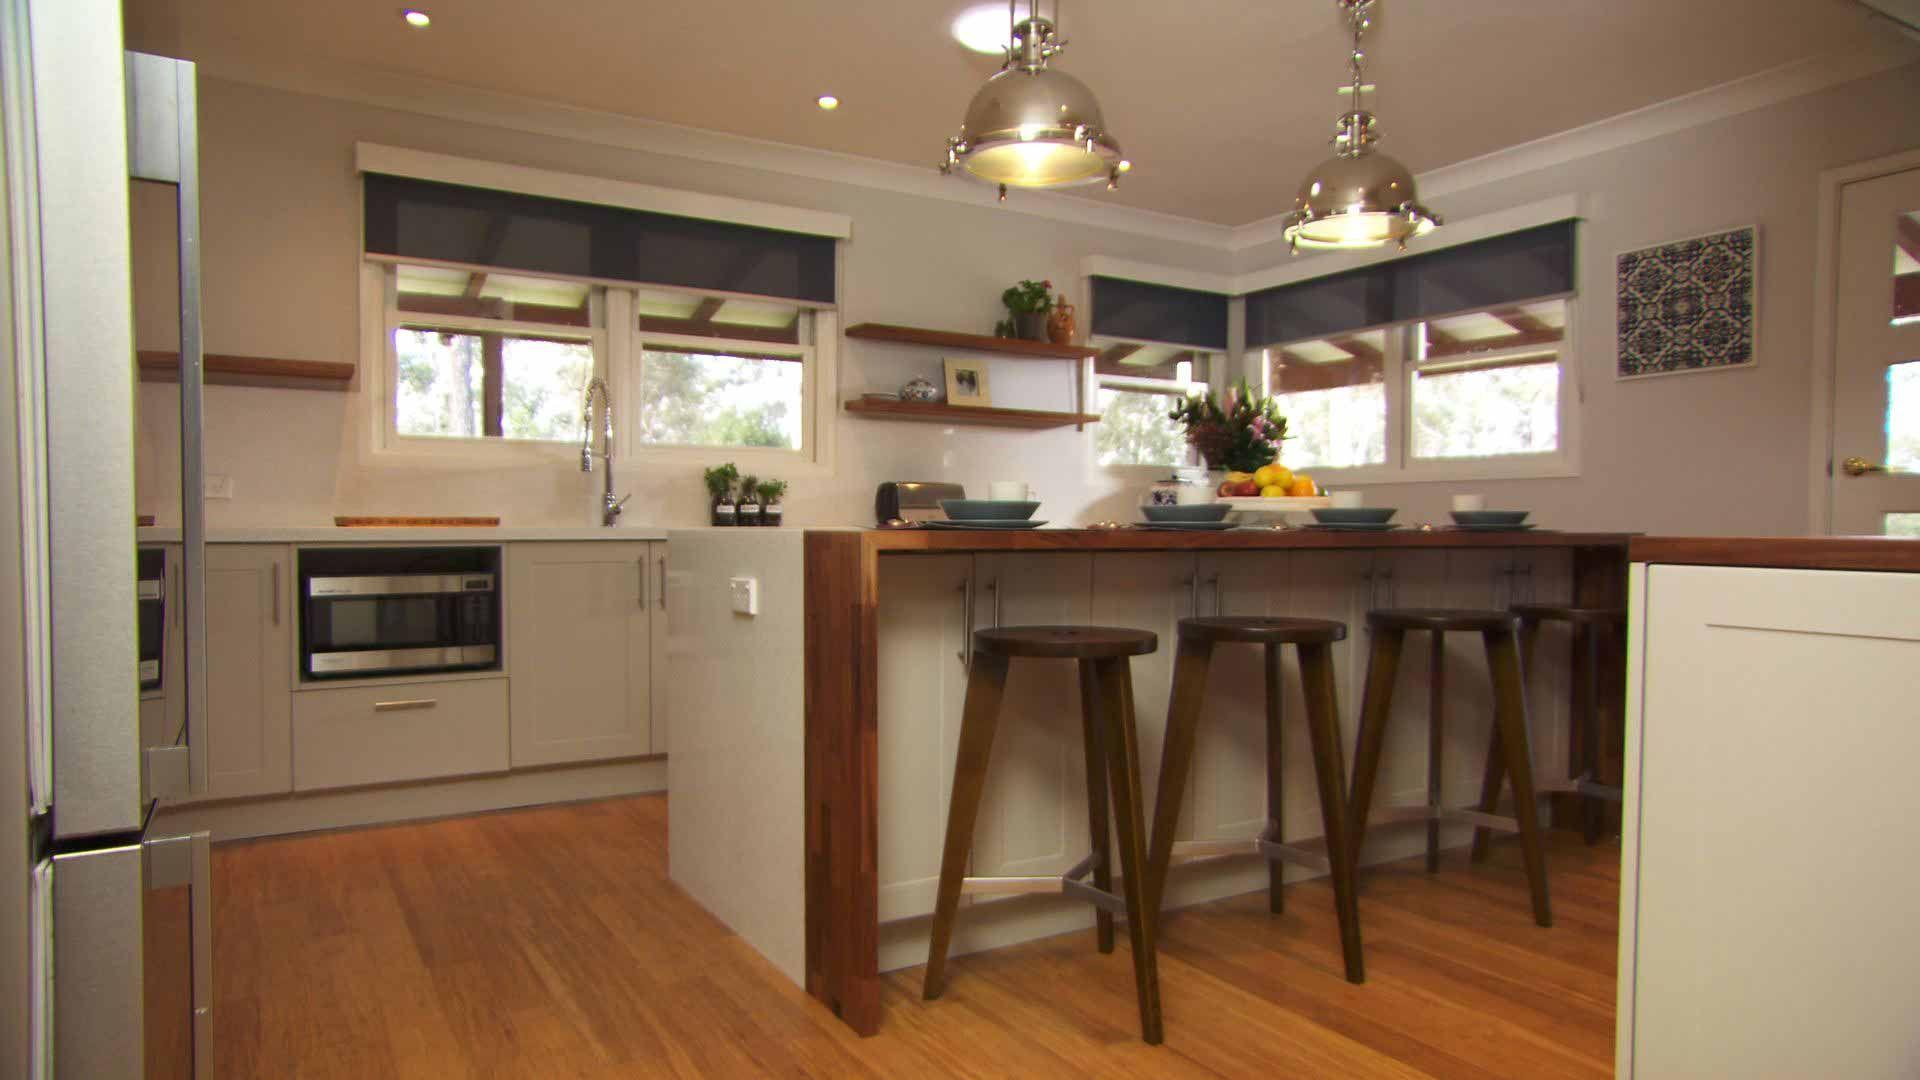 Family Kitchen Renovation | The Living Room Australia | Îlot cuisine ...